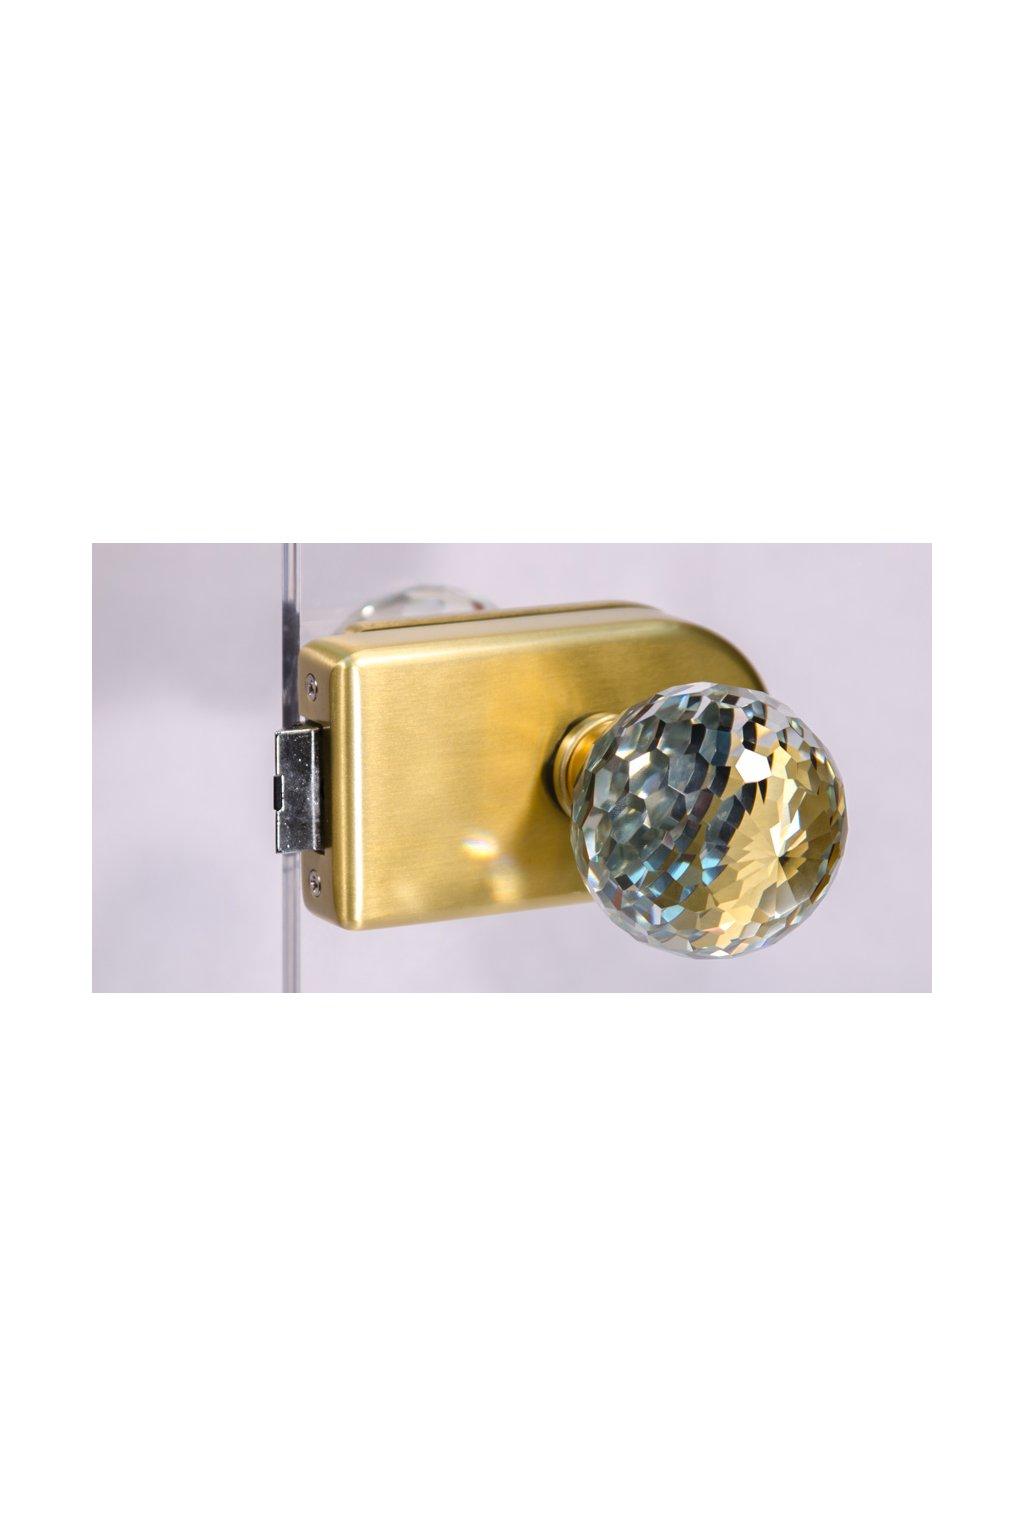 Onyx Krystal B6002 Glass